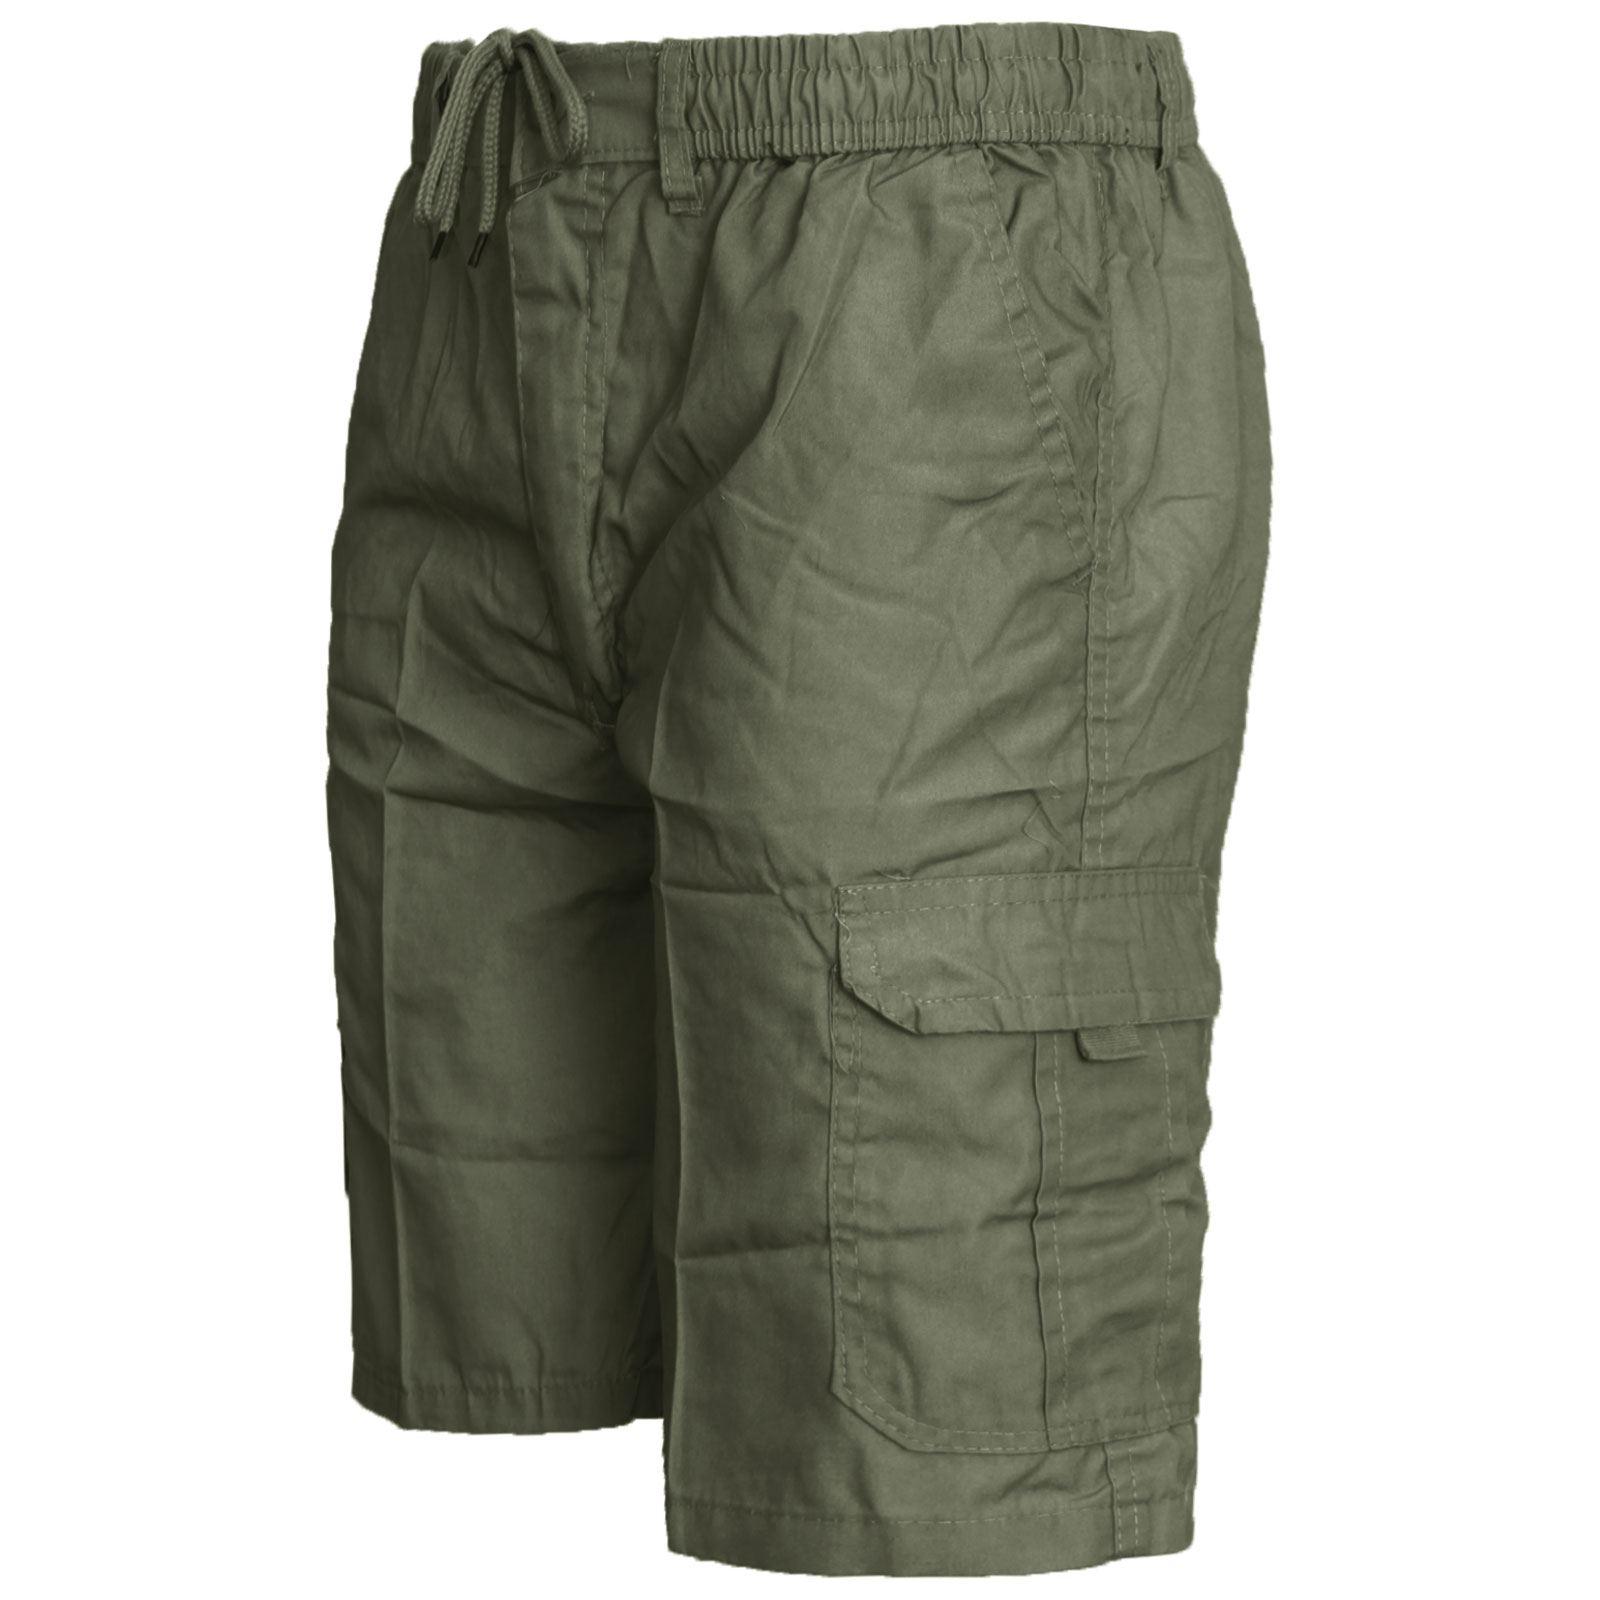 Da Uomo Elastico In Vita Cargo Combat Pantaloncini Tinta Unita Work Wear Pantaloncini cotone tasche